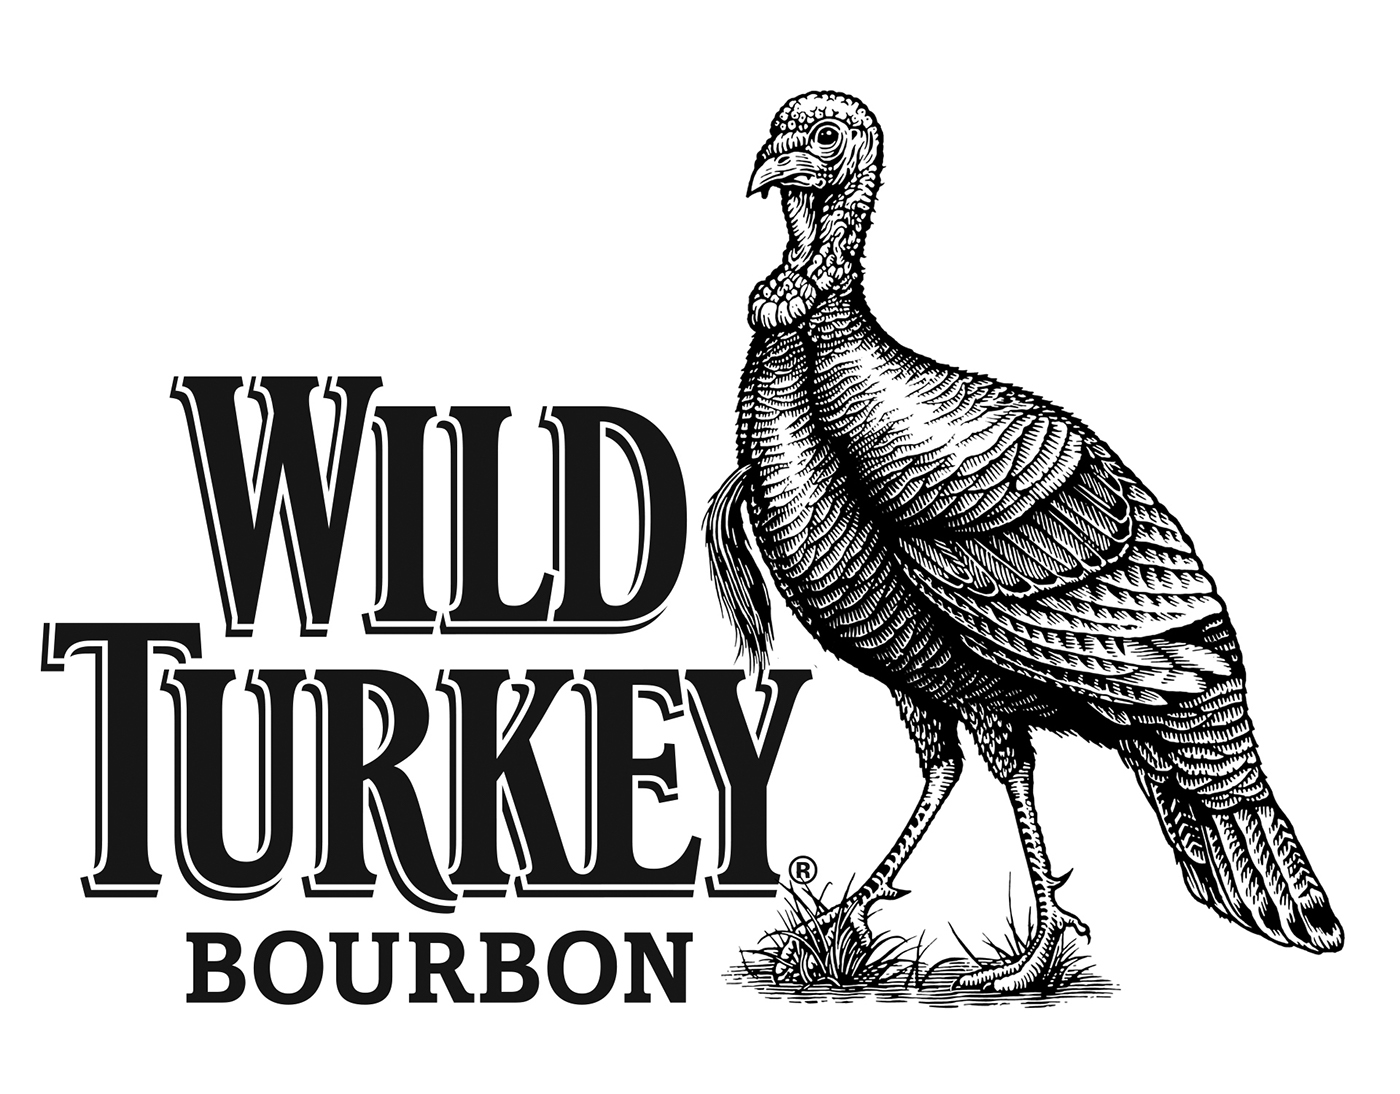 Wild Turkey Bourbon Illustrated By Steven Noble On Behance